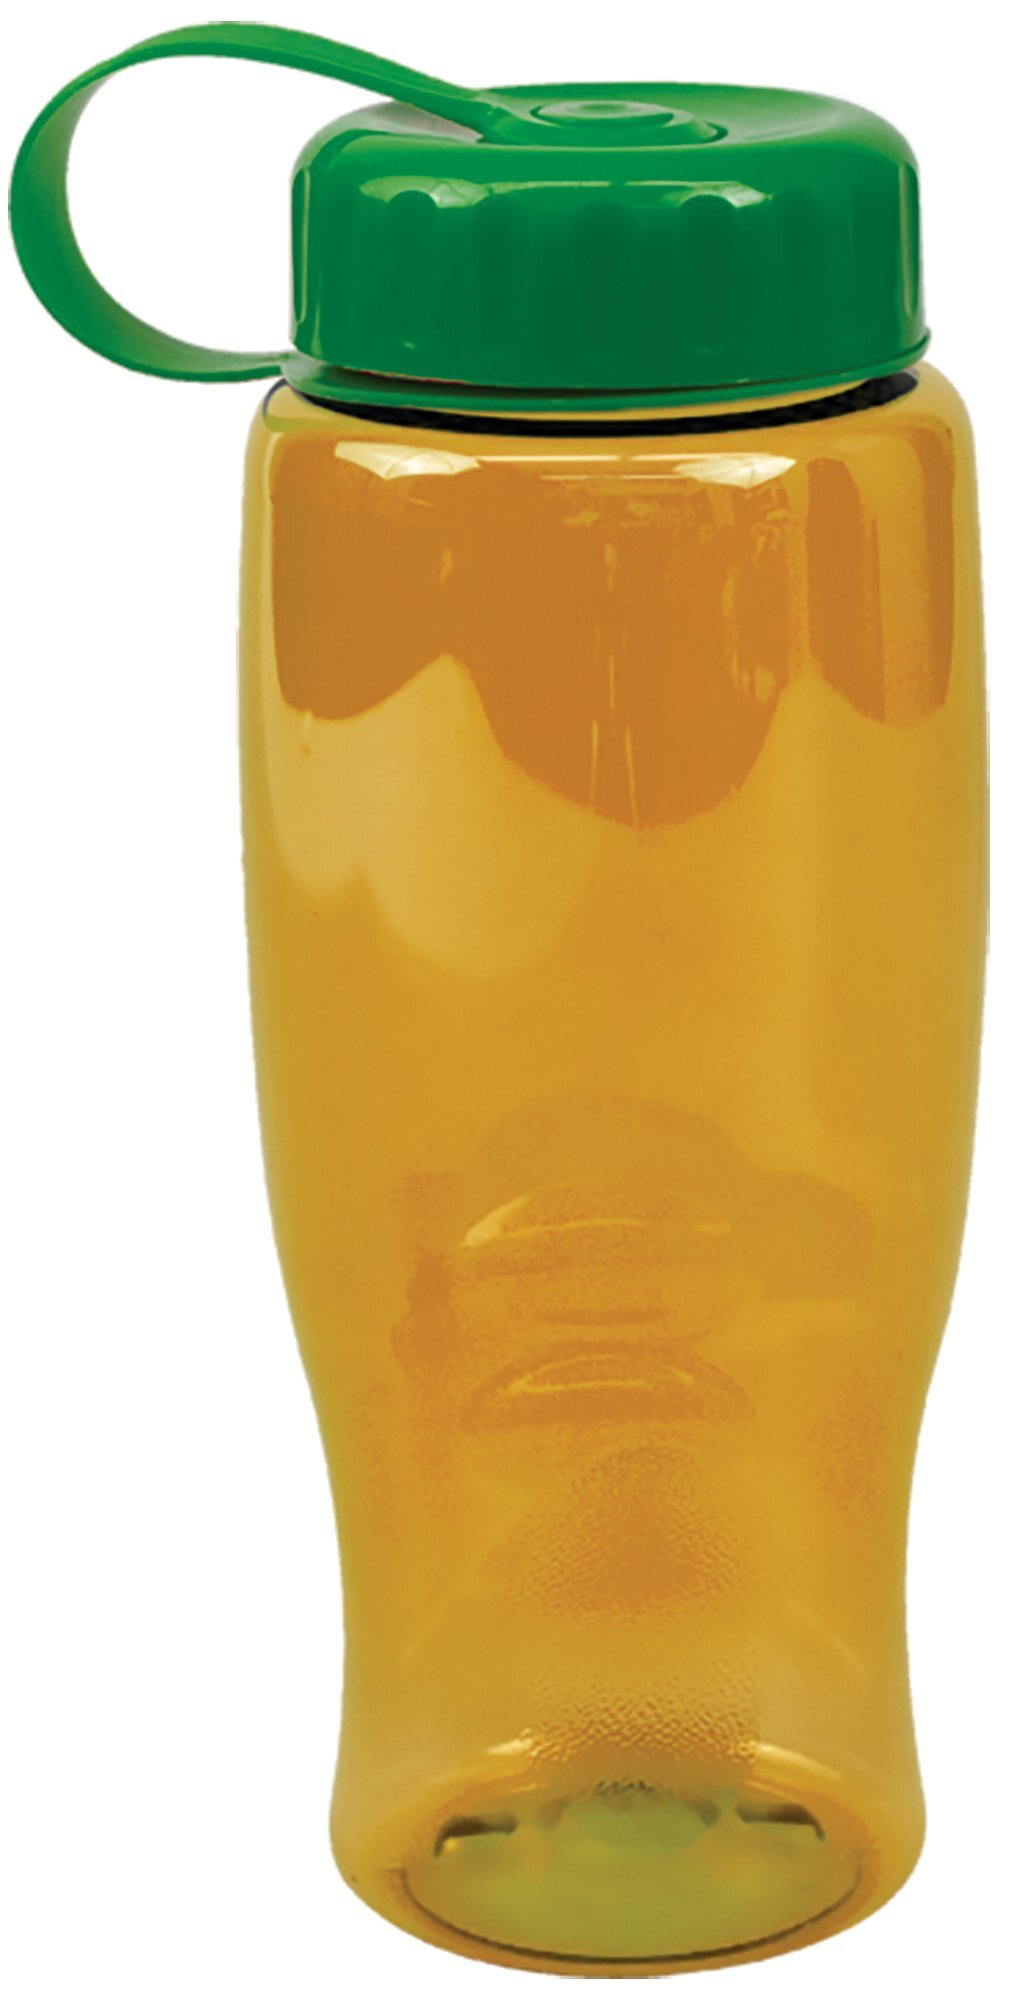 Transparent Grip Poly-Pure Sport Bottle, 27oz. - Tethered Lid